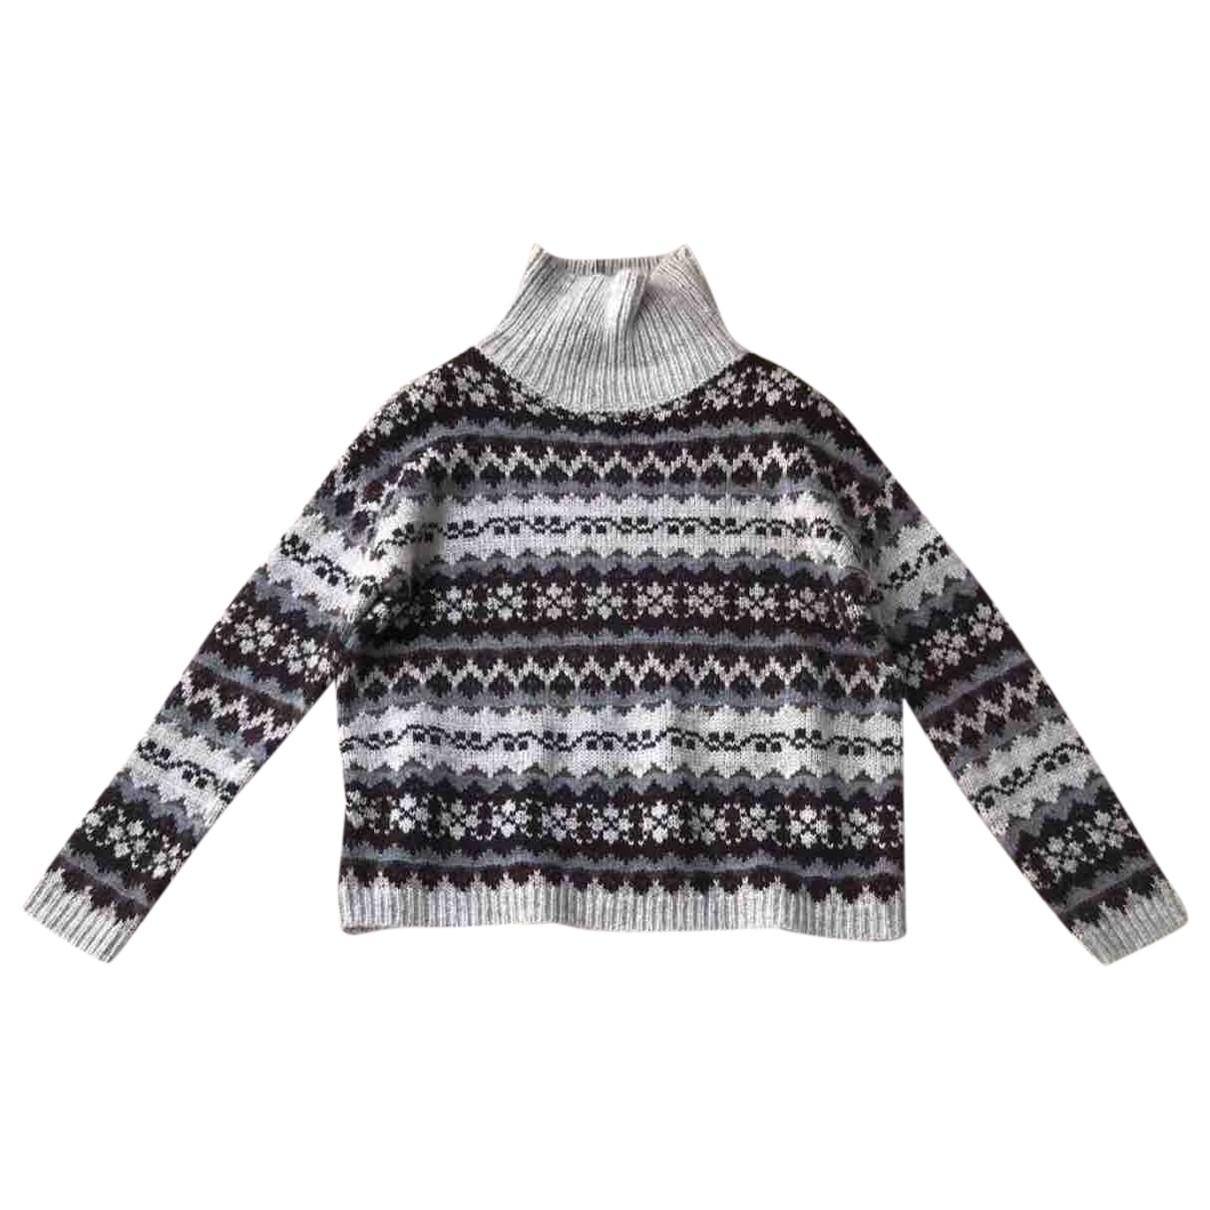 Nili Lotan \N Pullover in  Bunt Wolle